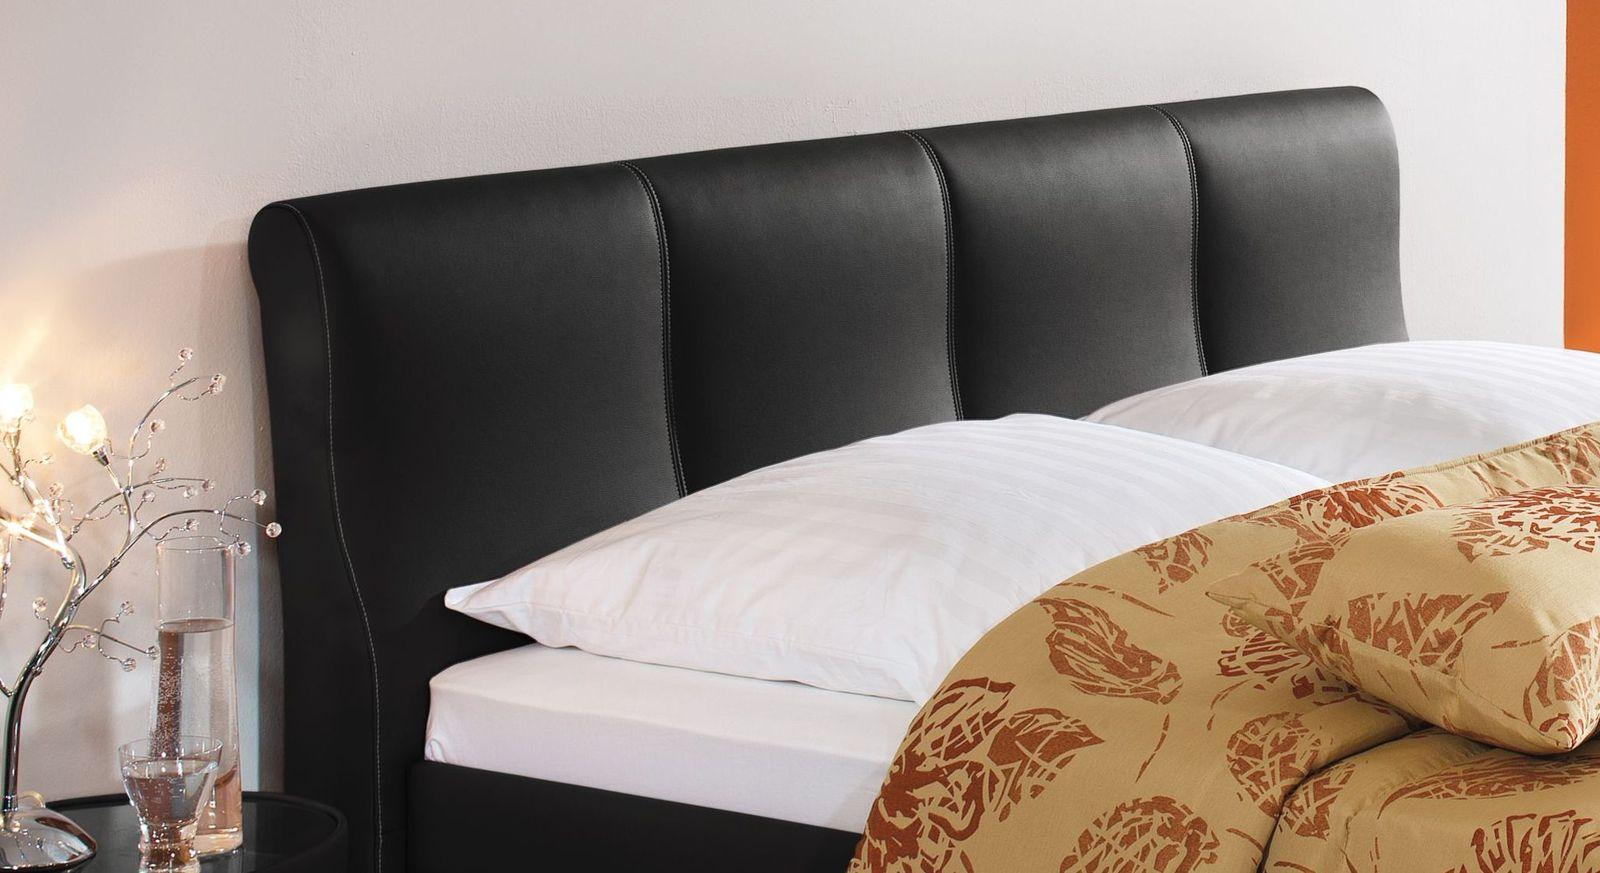 faszinierend bett kopfteil kissen fotos erindzain. Black Bedroom Furniture Sets. Home Design Ideas